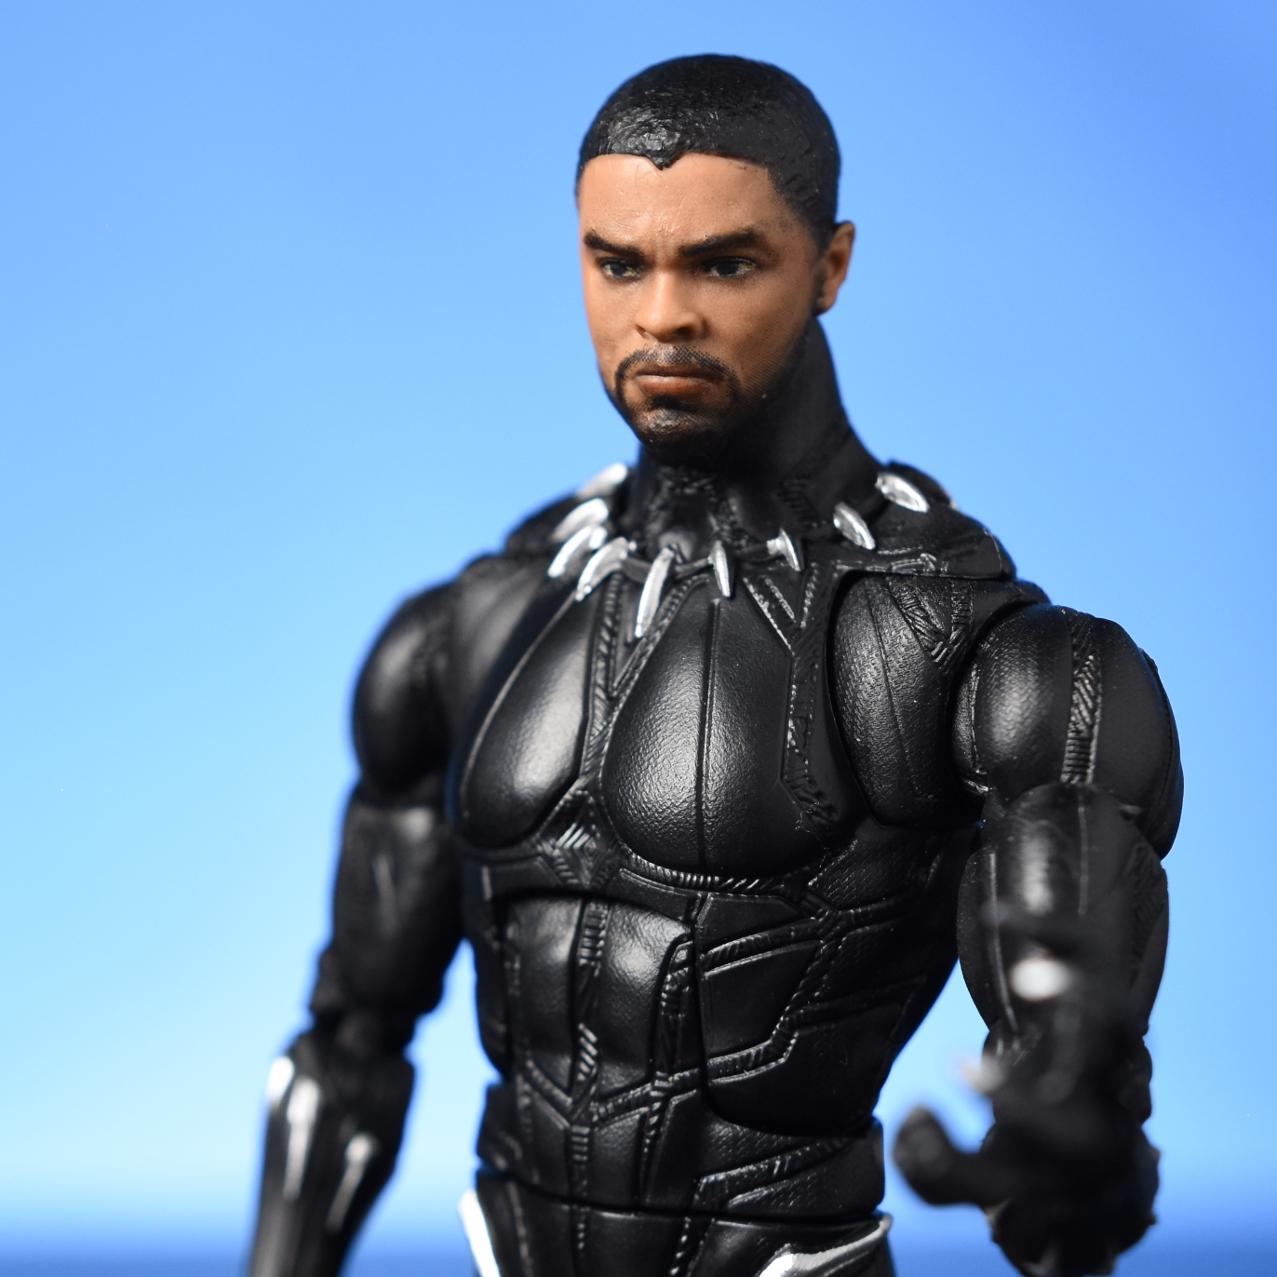 7eaa9aa5 Hasbro: Marvel Legends Black Panther Movie Figures | The Fwoosh